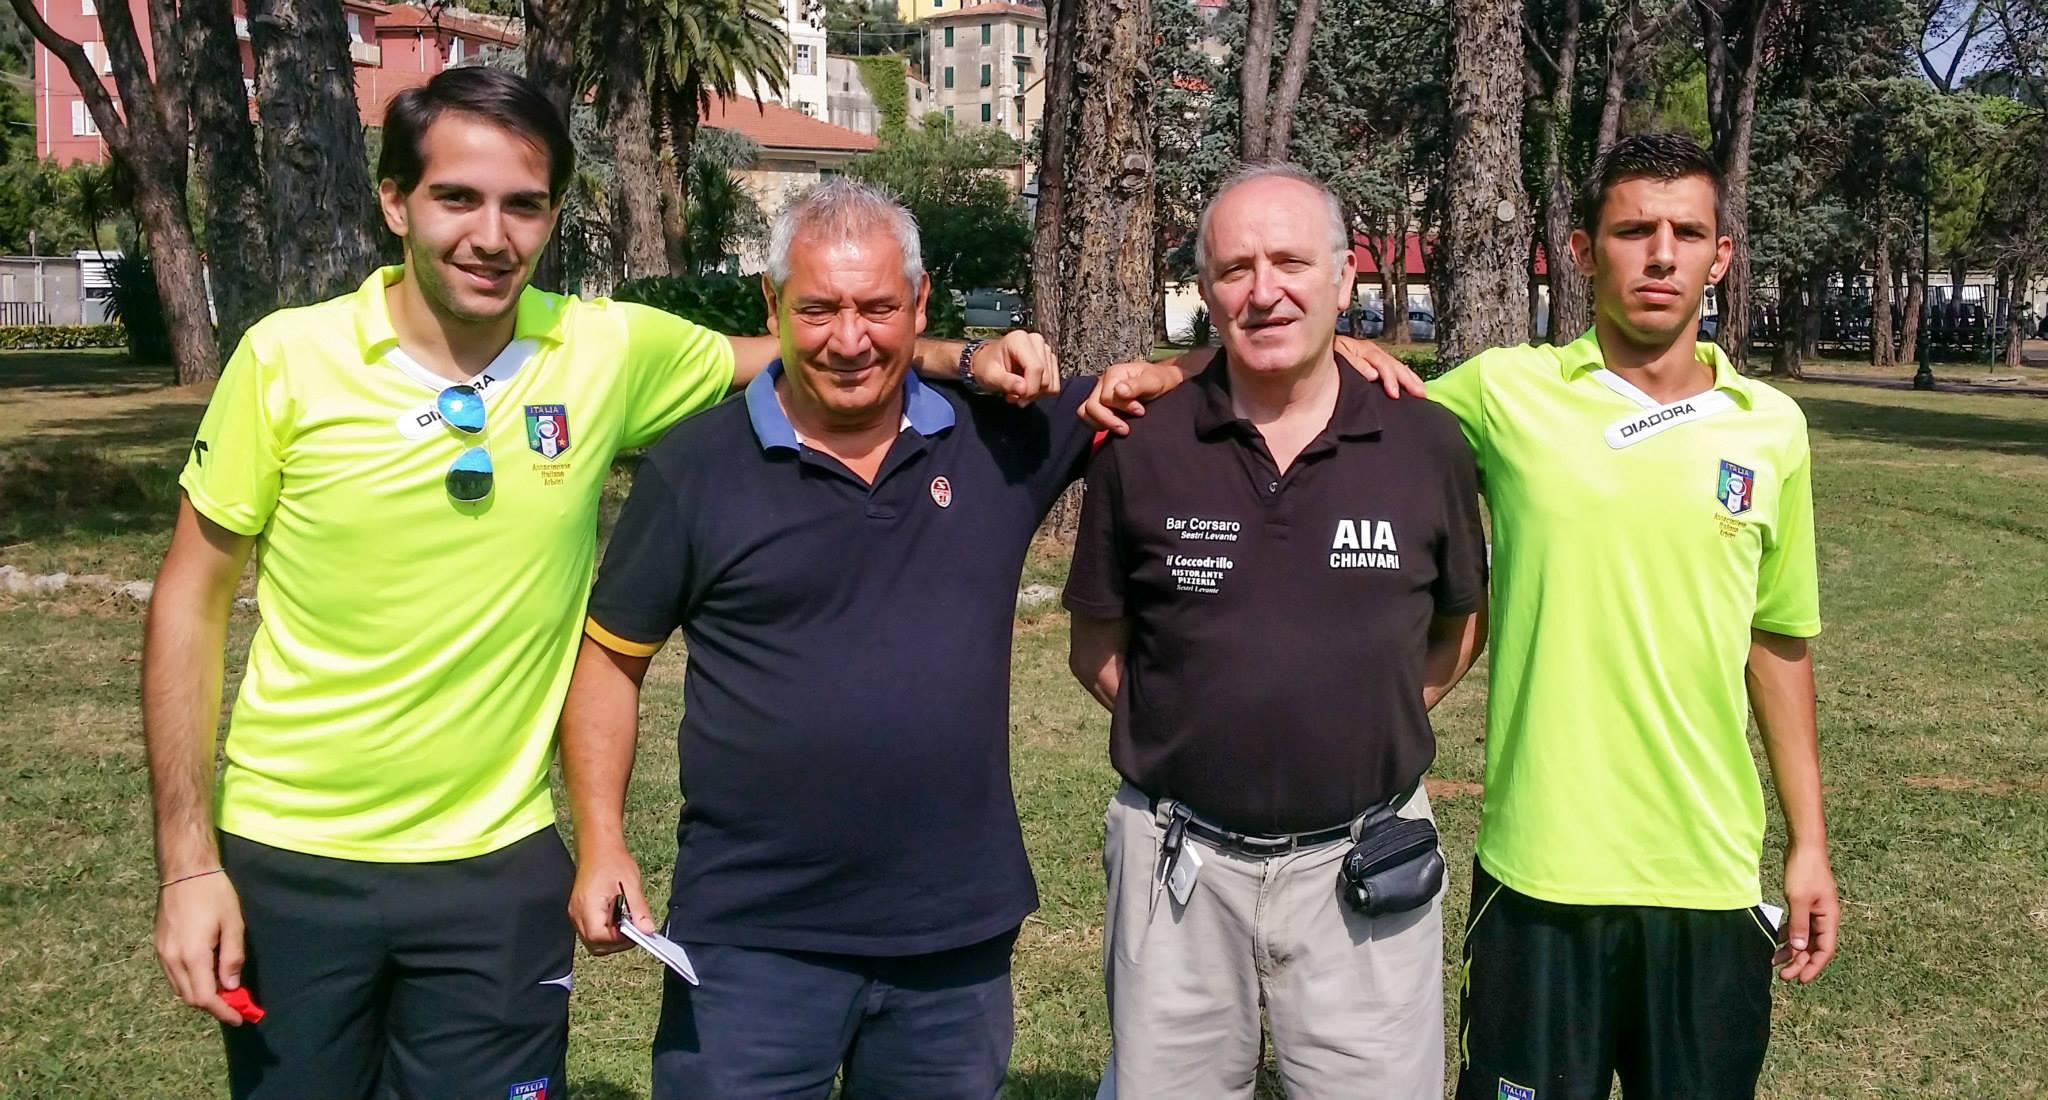 Da sx: AE Emmanuel Crova, AB Giovanni Piero Garilli, AB Giorgio Bacigalupi, AE Emanuele Quercioli